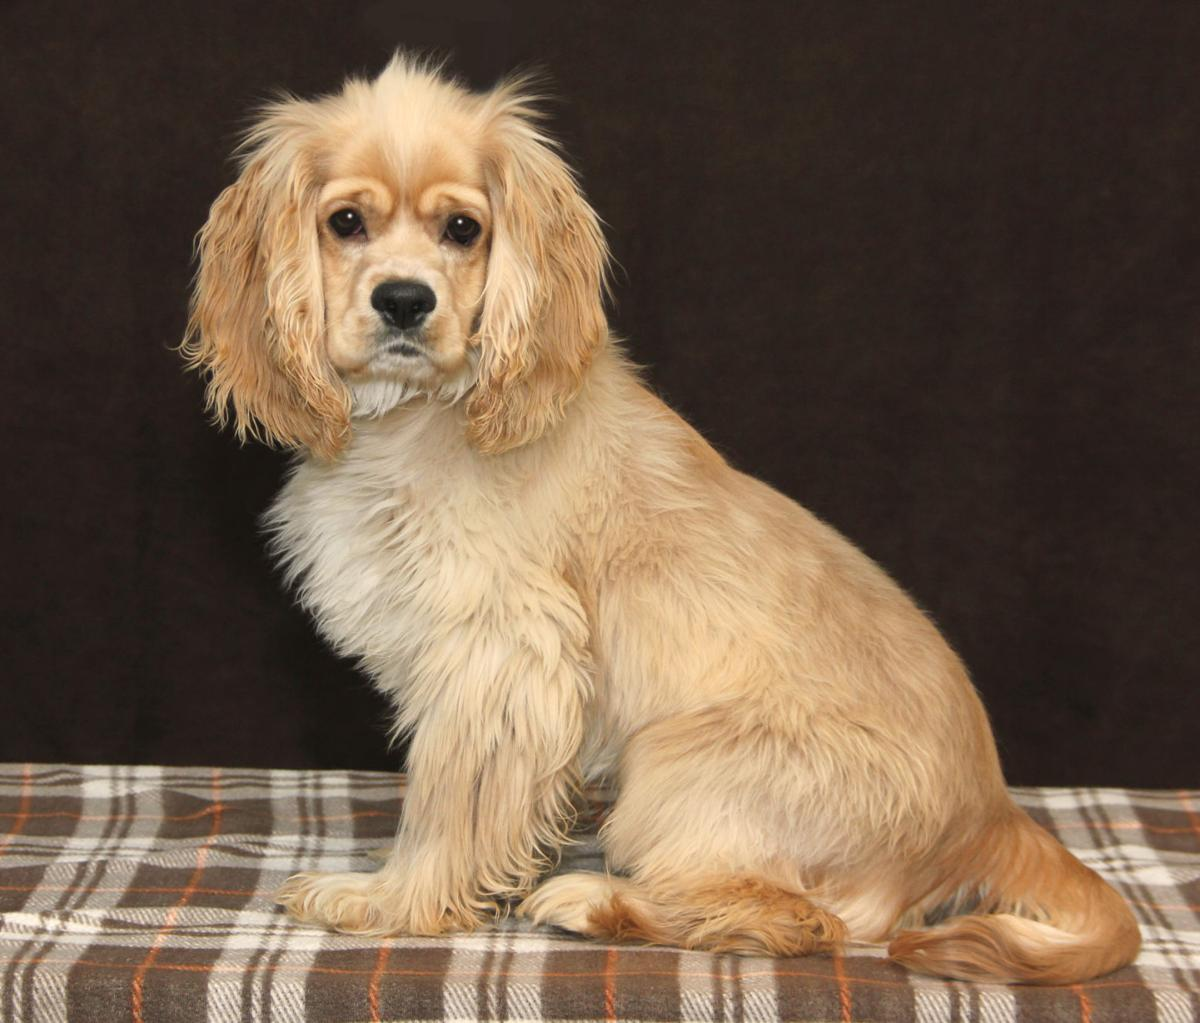 SLIDESHOW: Pets of the Week   Local News   goshennews com